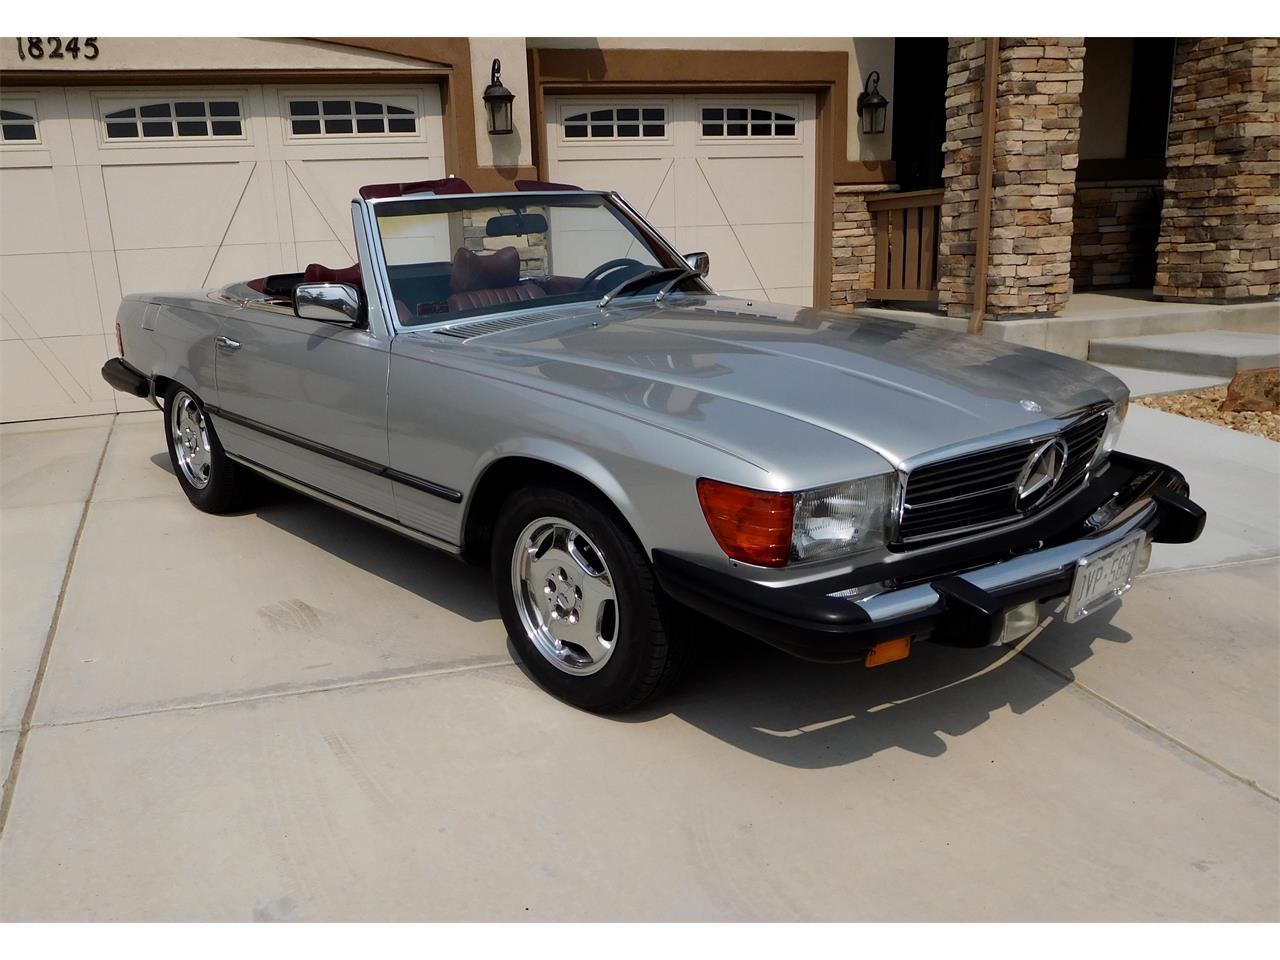 For Sale: 1979 Mercedes-Benz 450SL in Parker, Colorado